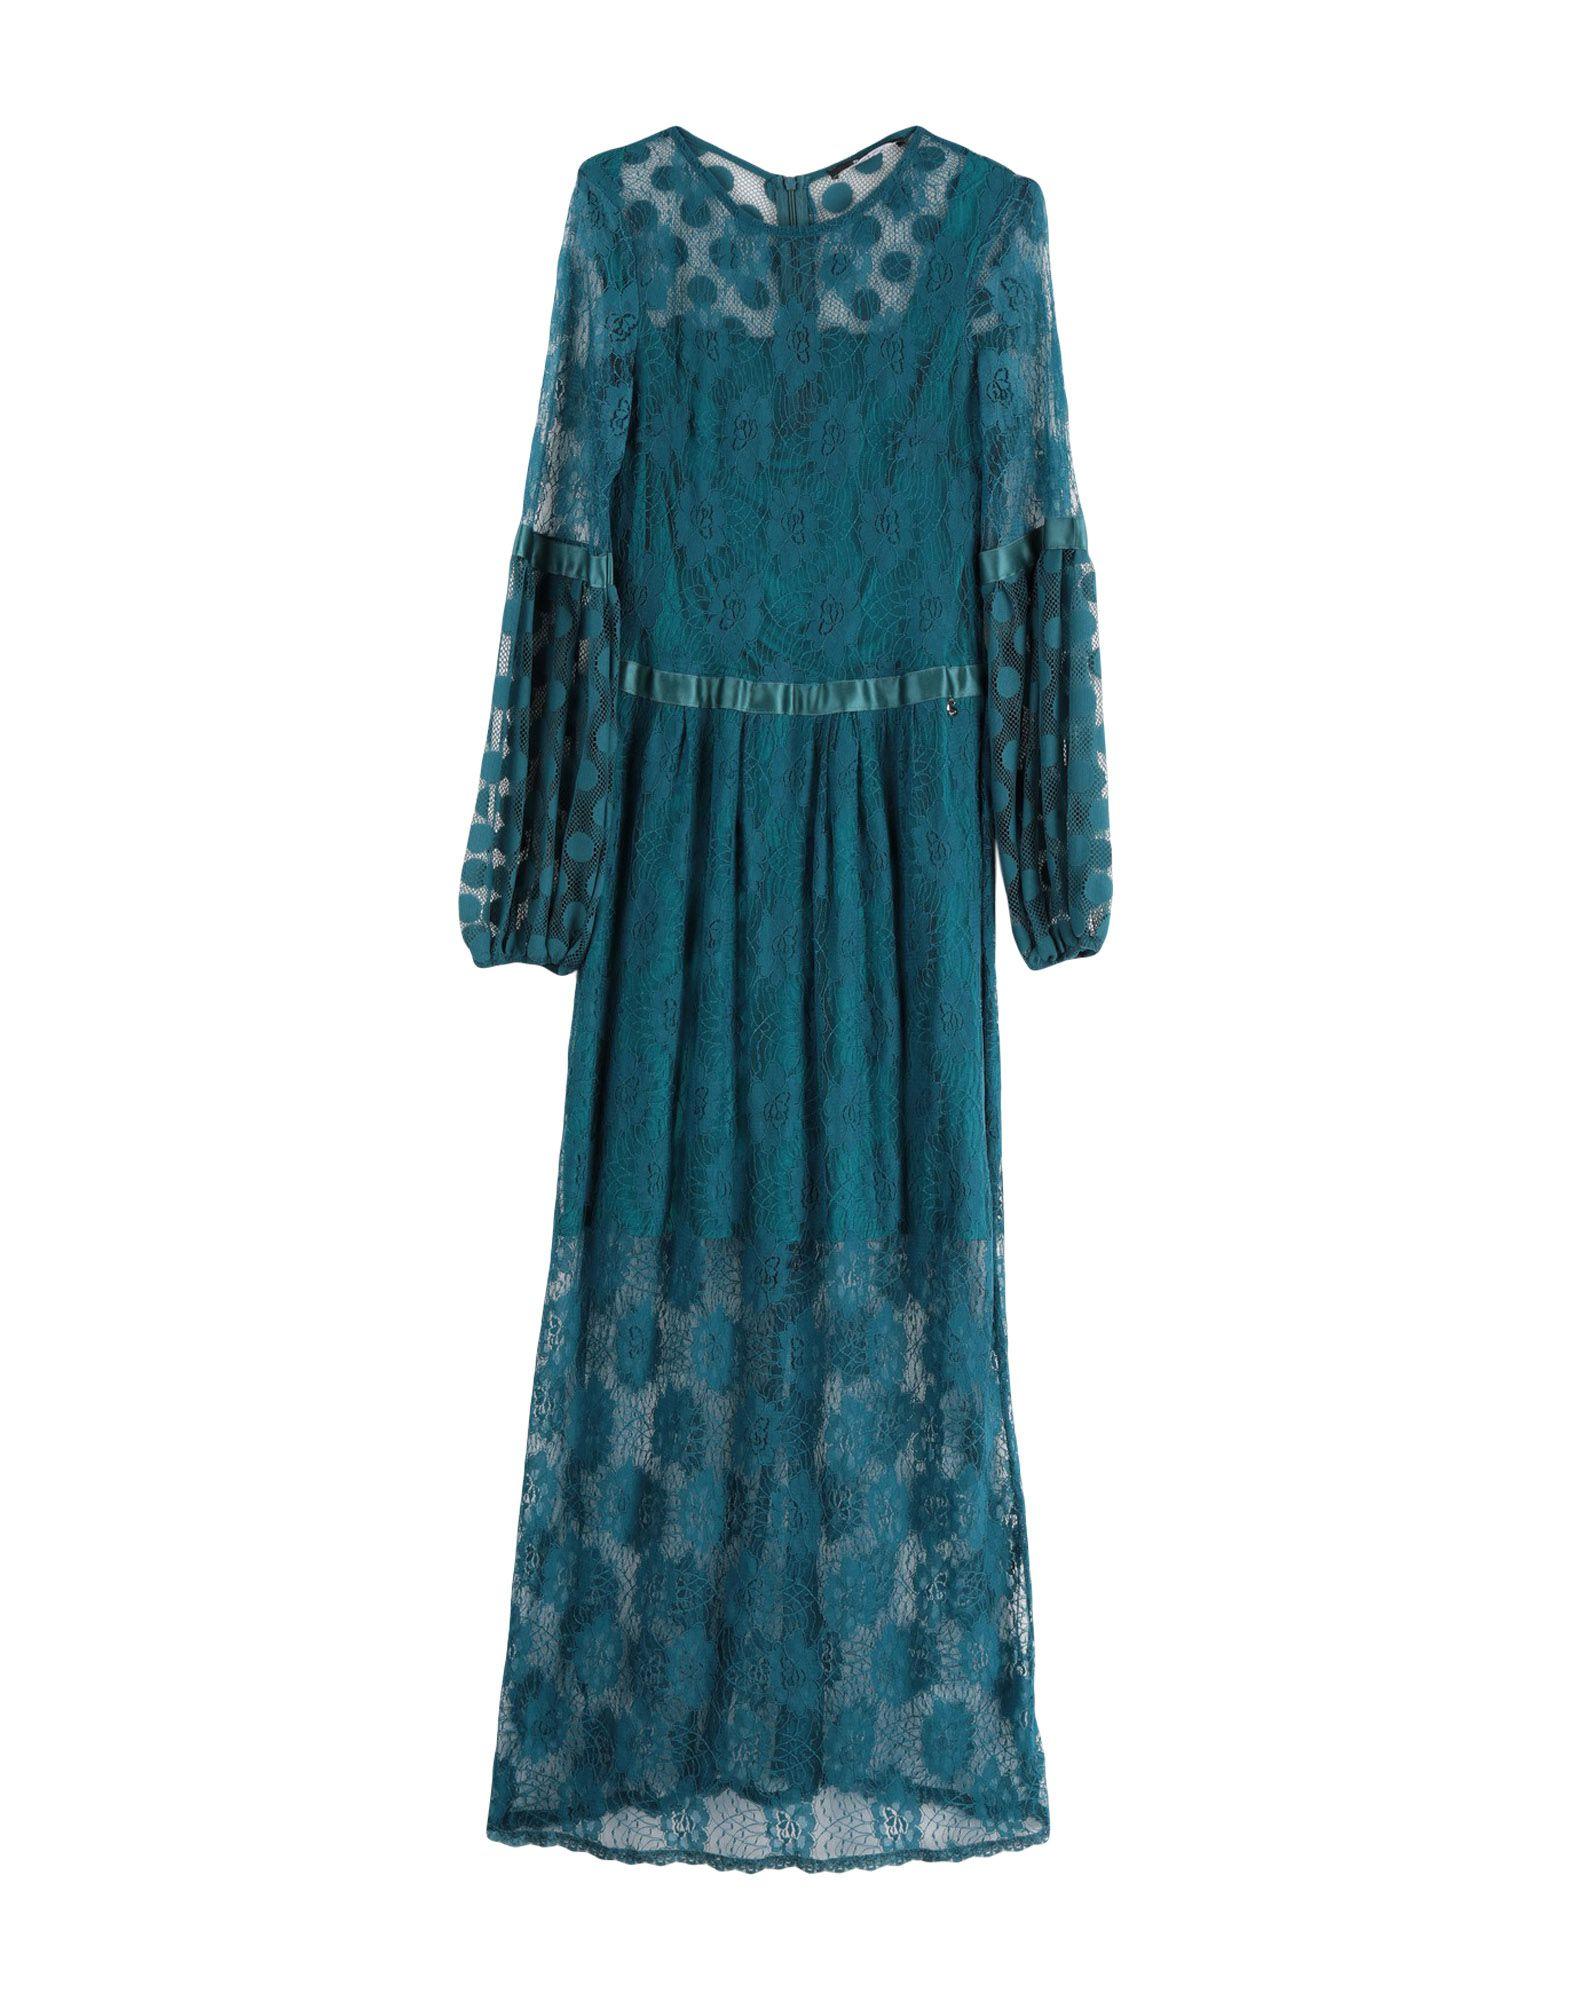 SISTE' S Короткое платье пылесос моющий thomas vestfalia xt